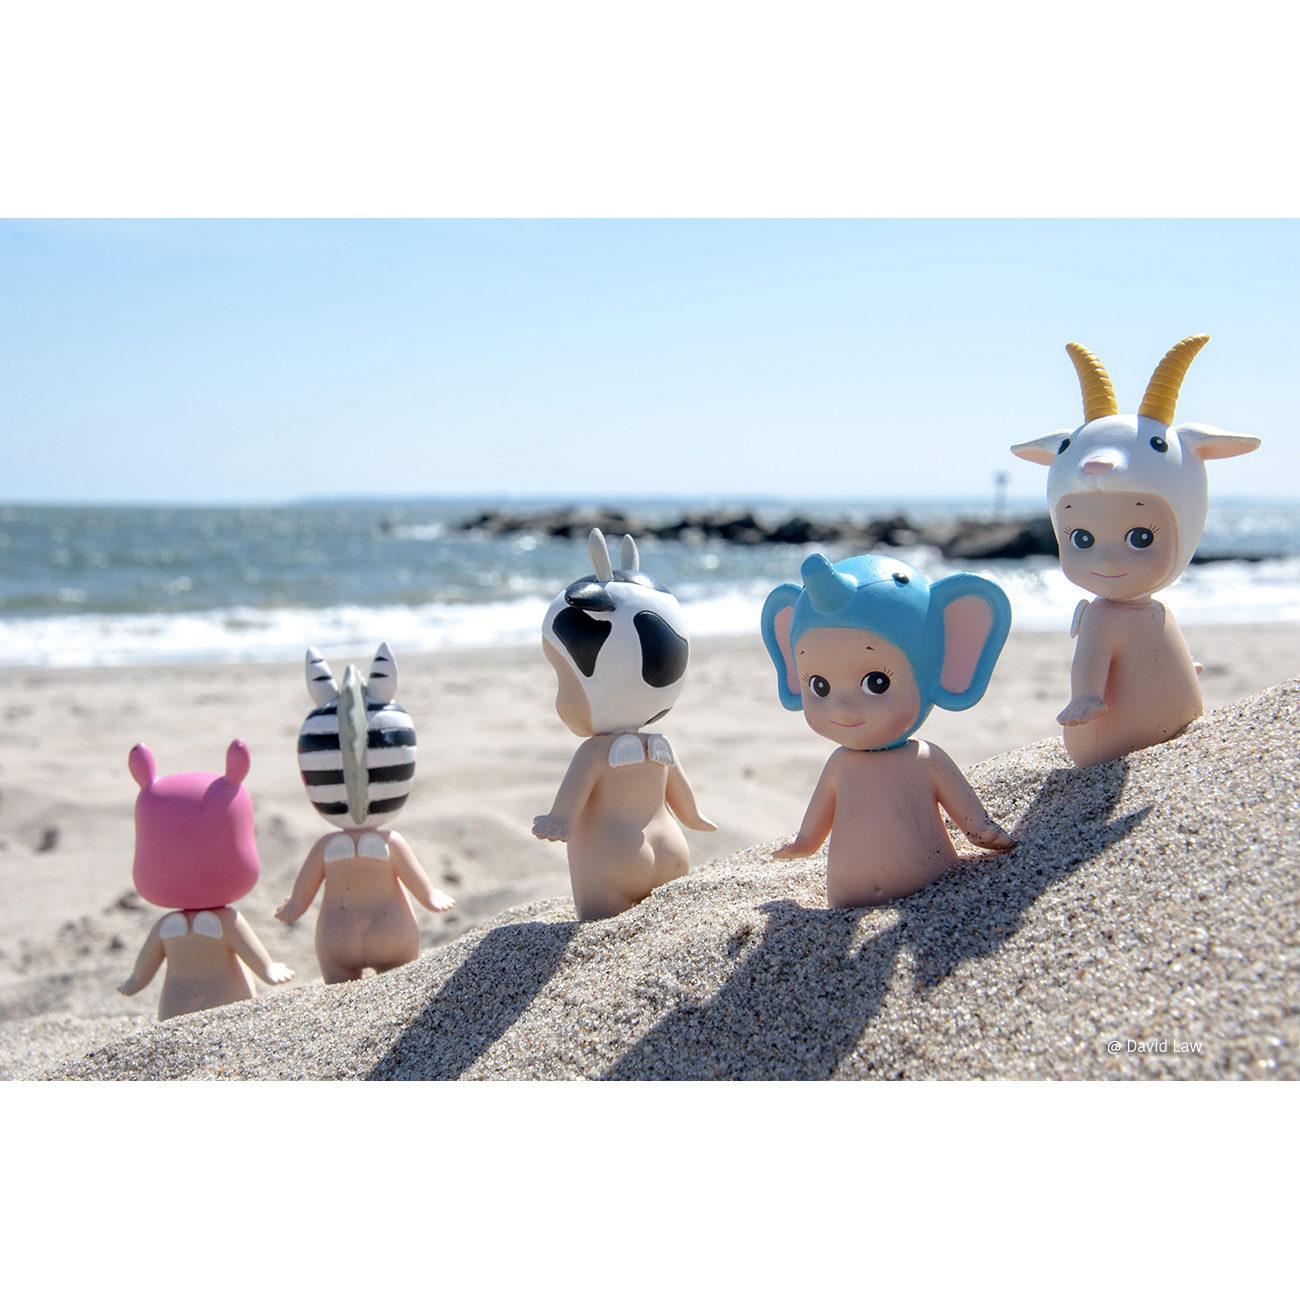 Coney Island Beach III 20x30 copie